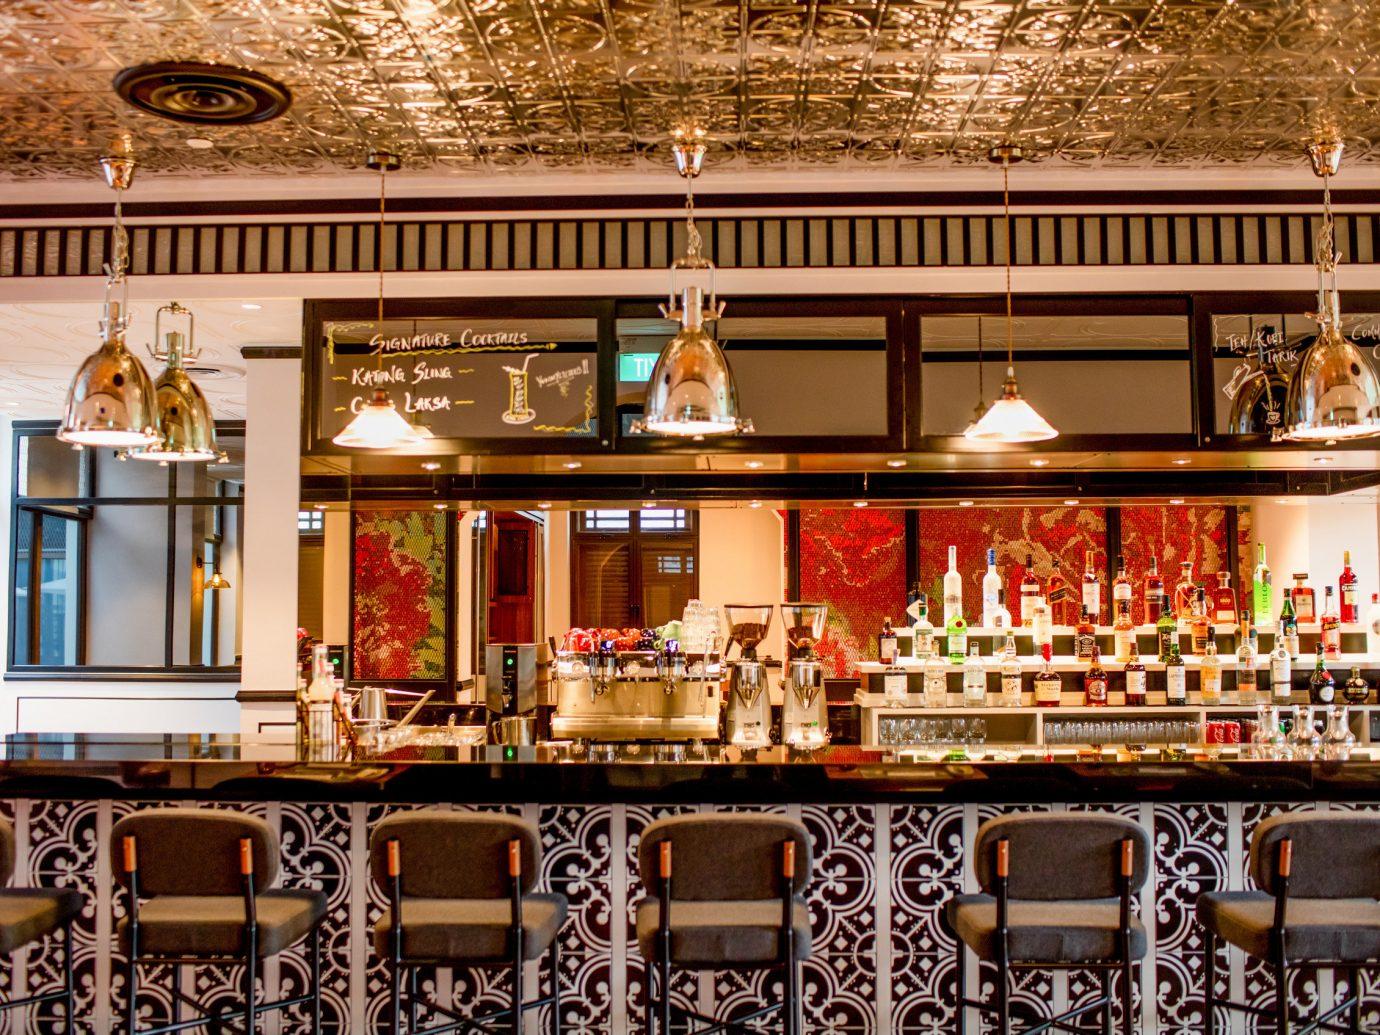 Hotels Romance meal restaurant Bar several